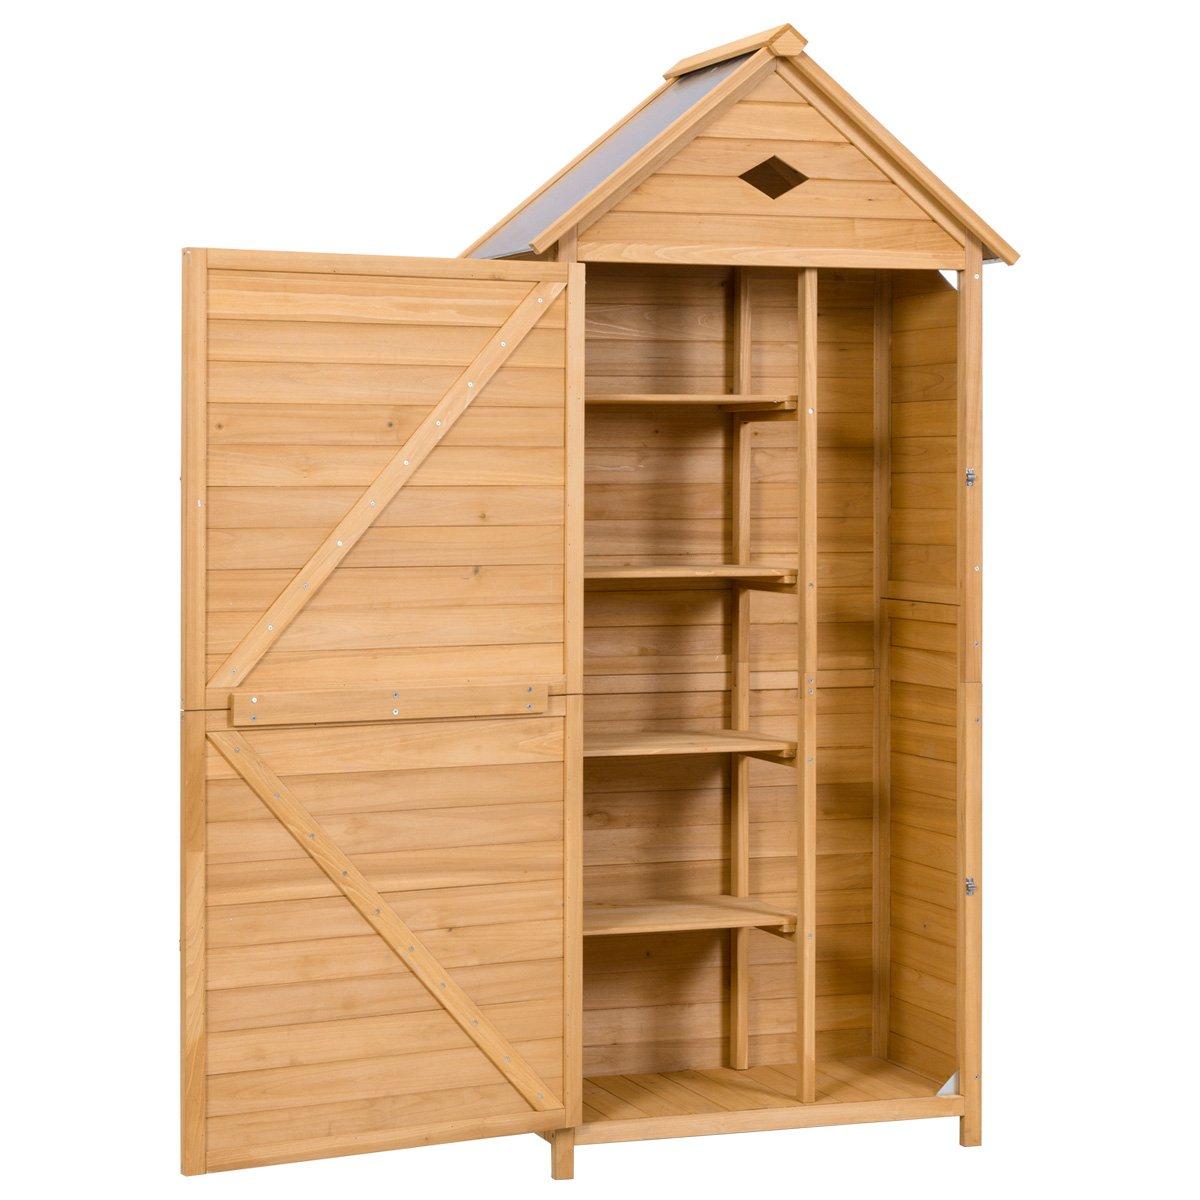 Goplus Outdoor Storage Shed Yard Locker Storage Hutch Wooden Arrow Shed for Garden Superbuy